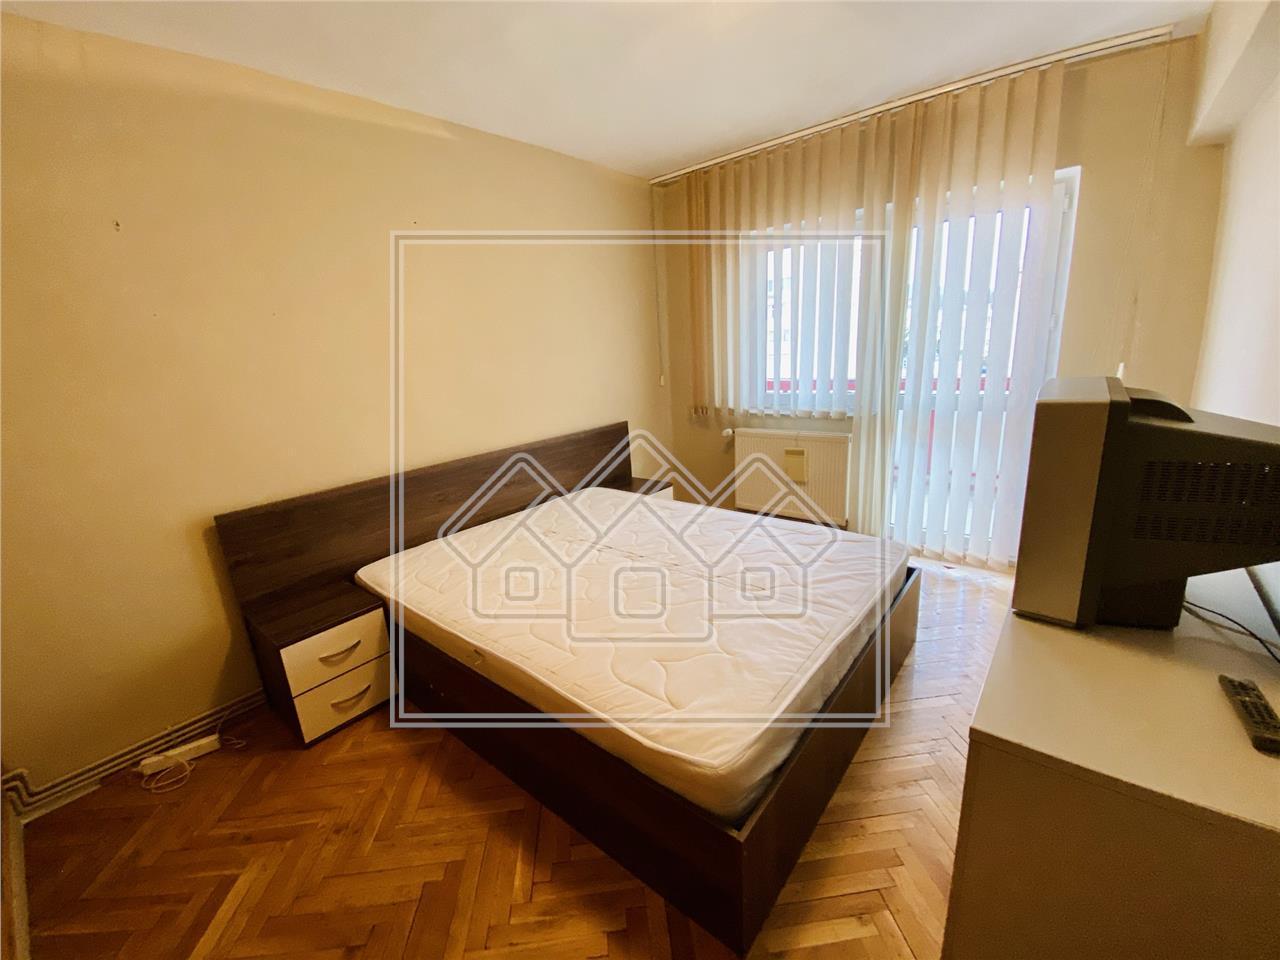 Apartament de inchiriat in Sibiu - etaj intermediar - 70 mp utili